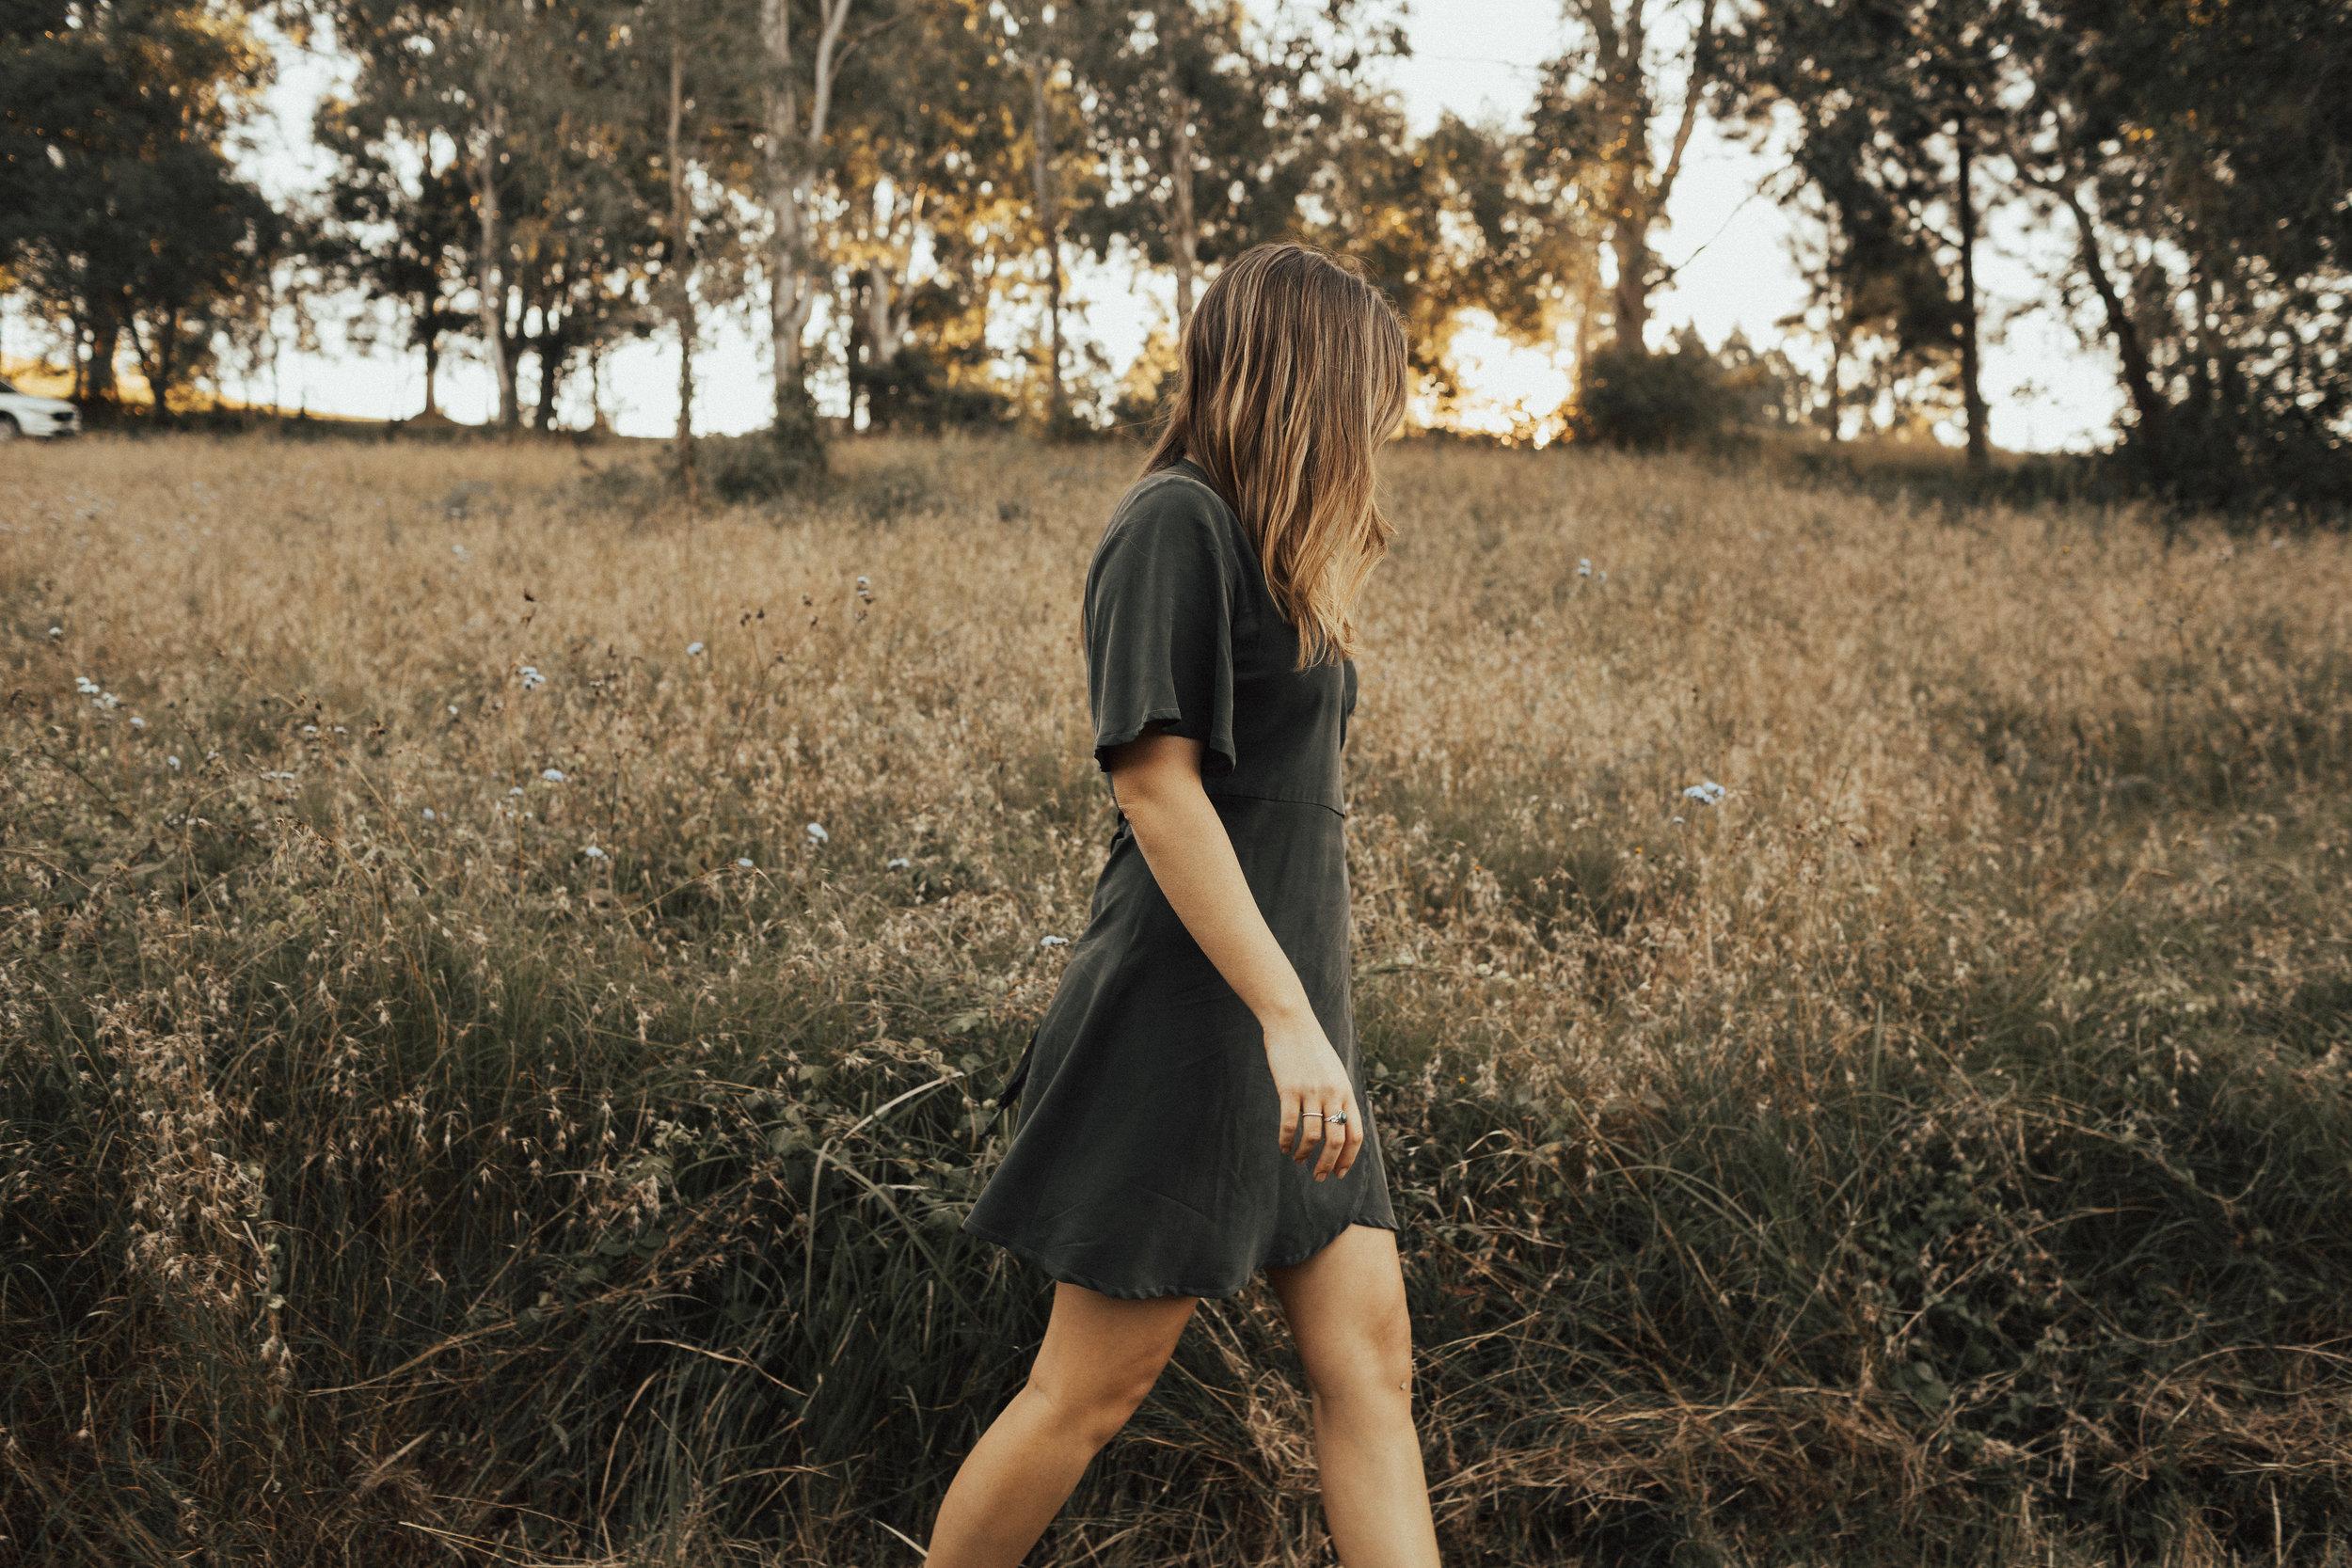 Tasi Travels' Moss Wilder Wrap Dress is handmade from sustainable Tencel